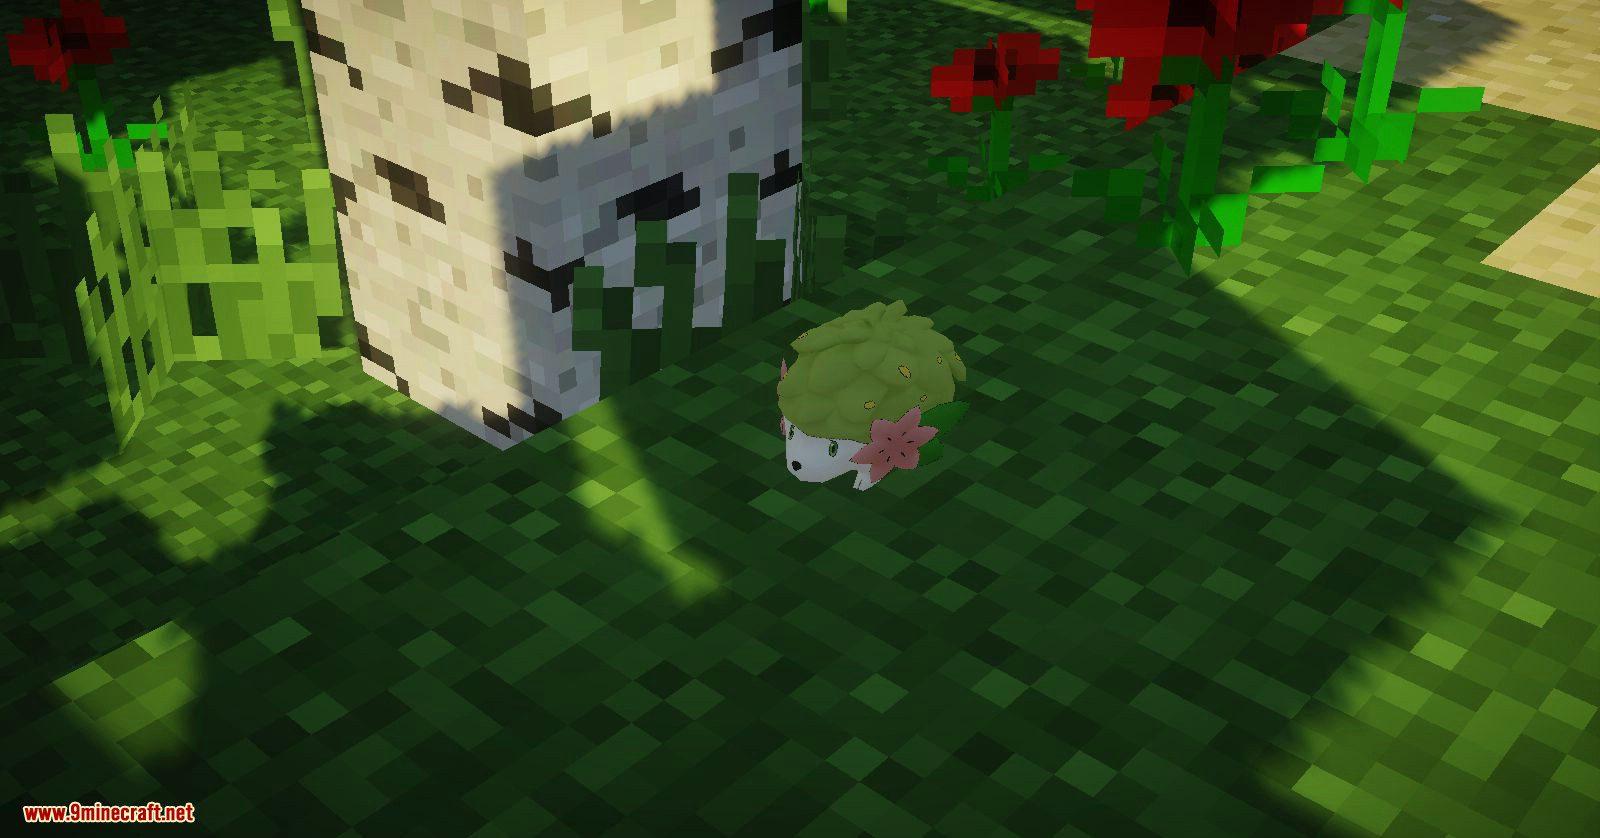 Gameshark mod for Minecraft (14)